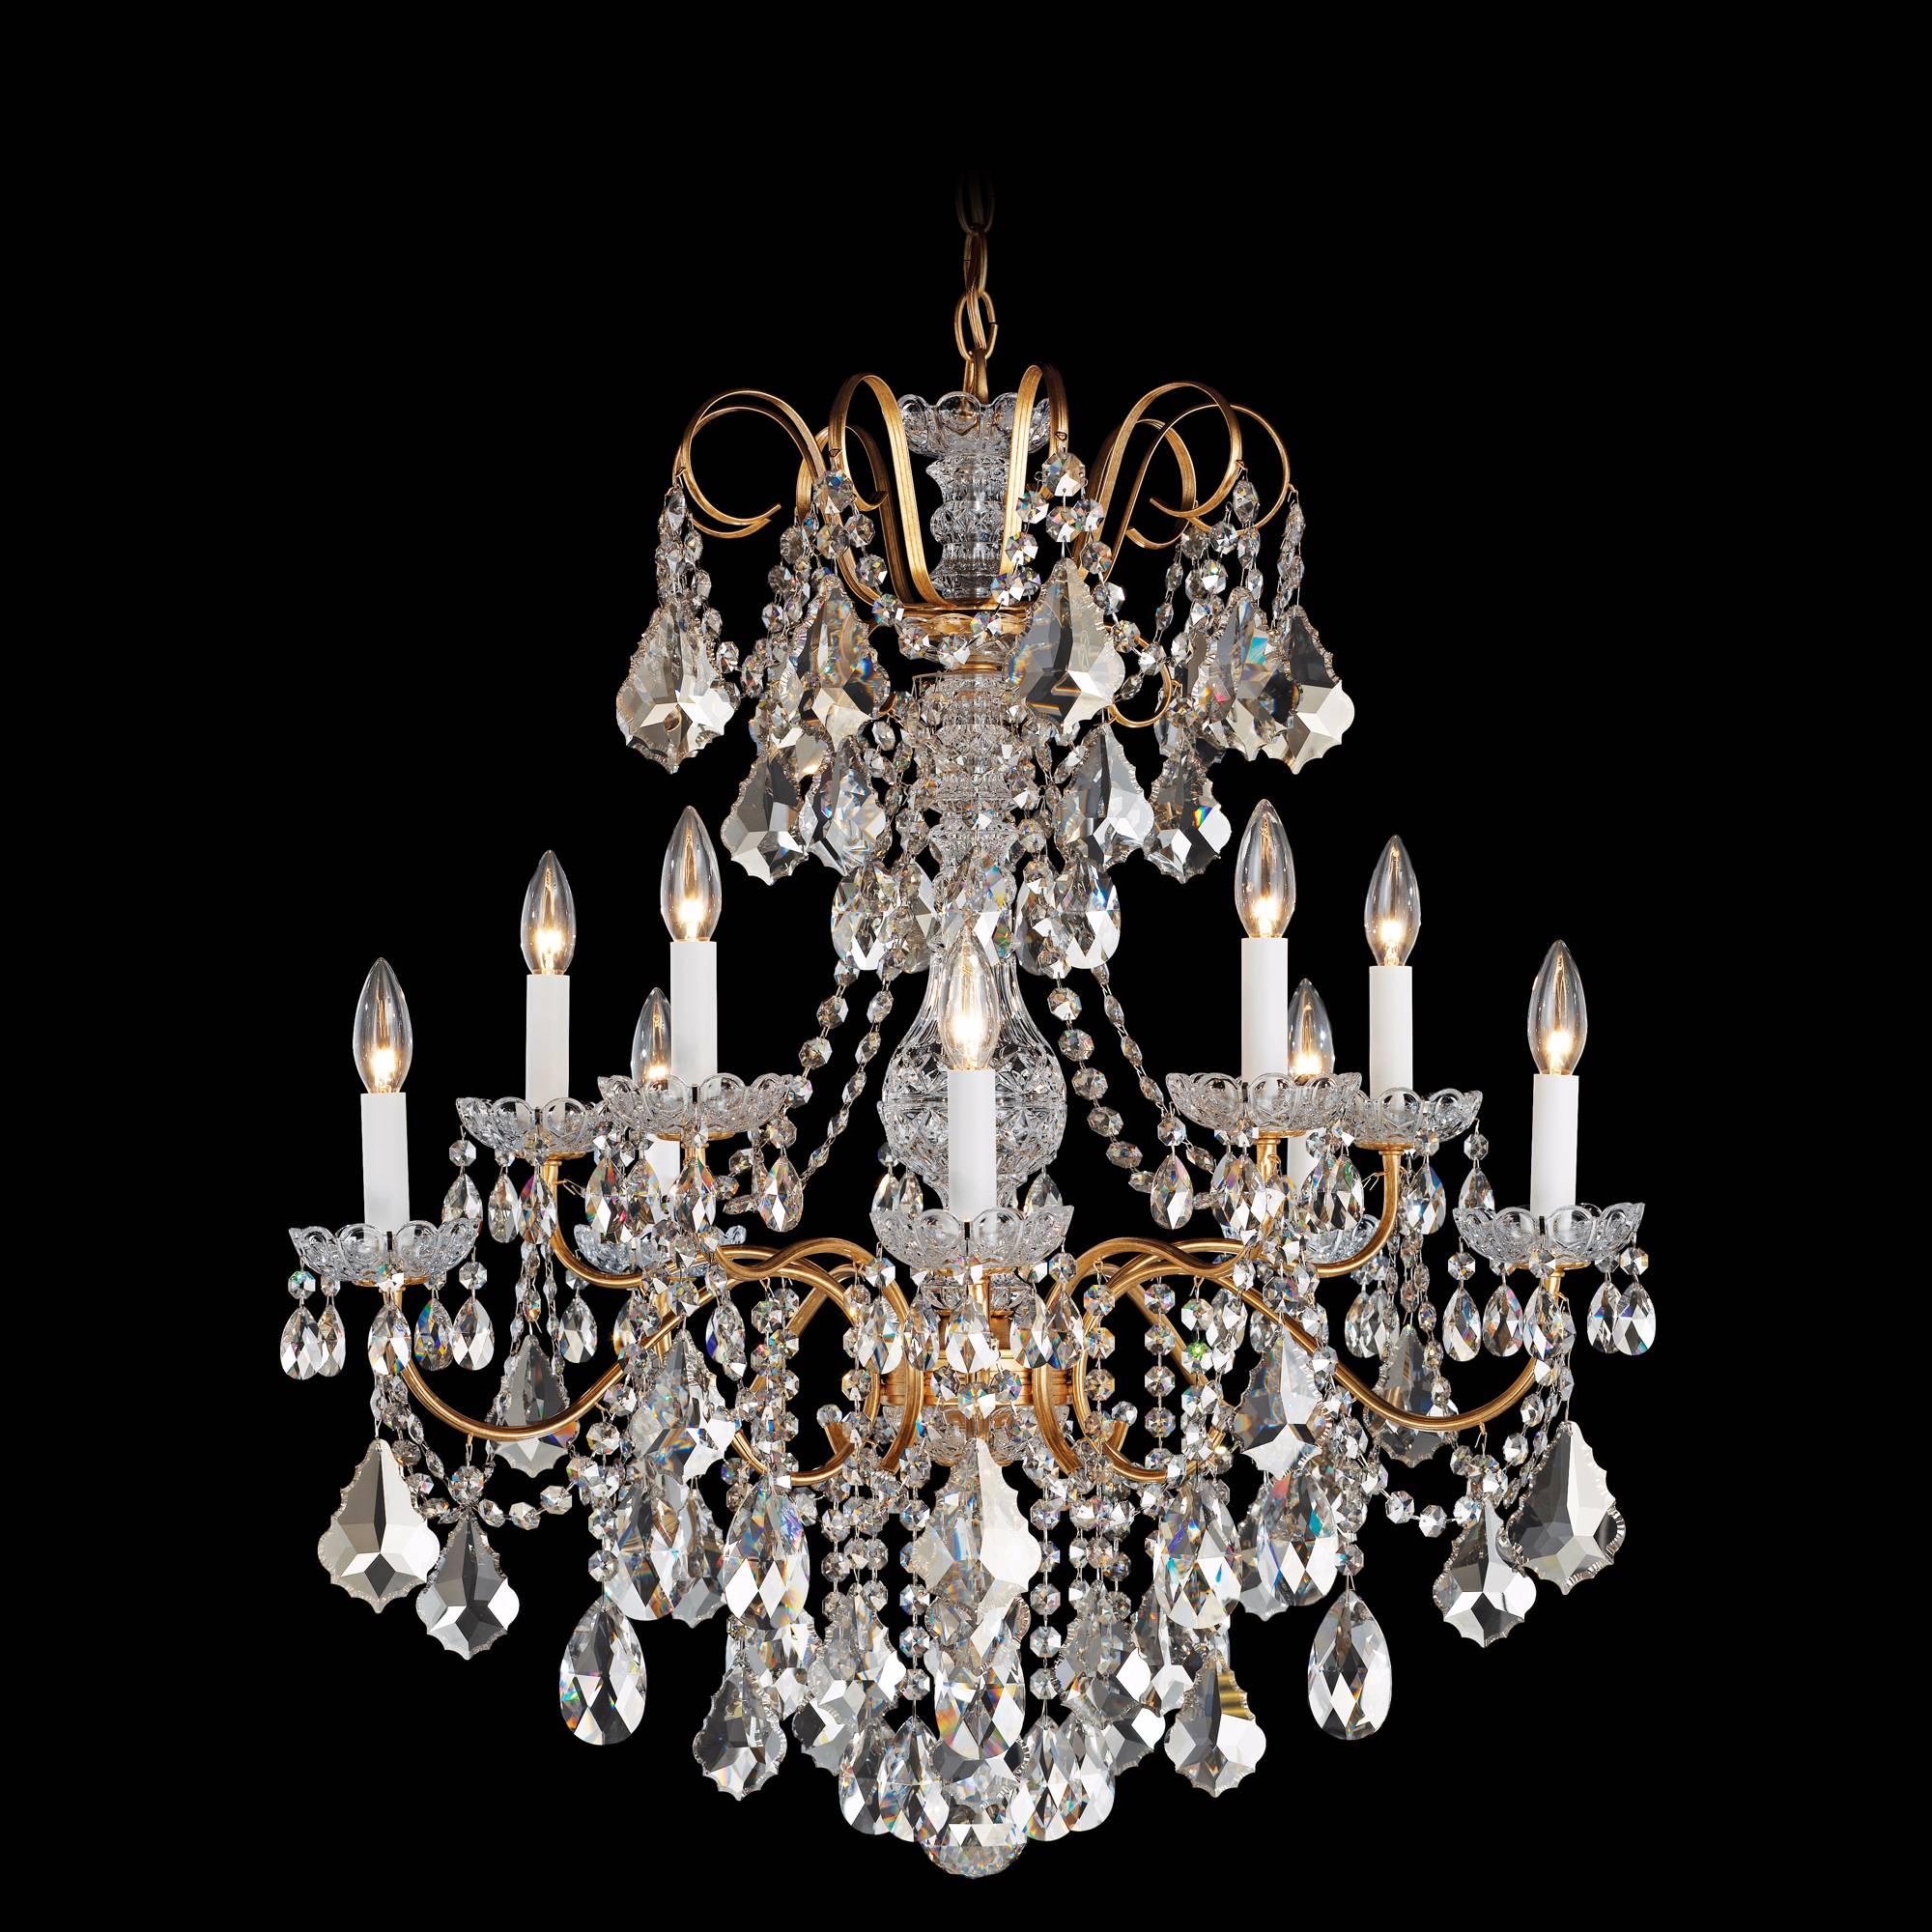 Schonbek La Scala Collection 28 Quot Wide Crystal Chandelier